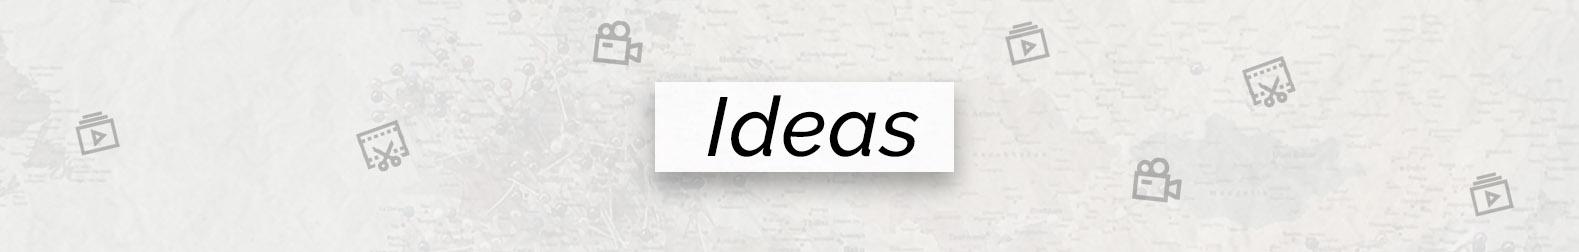 ideas banner.jpg